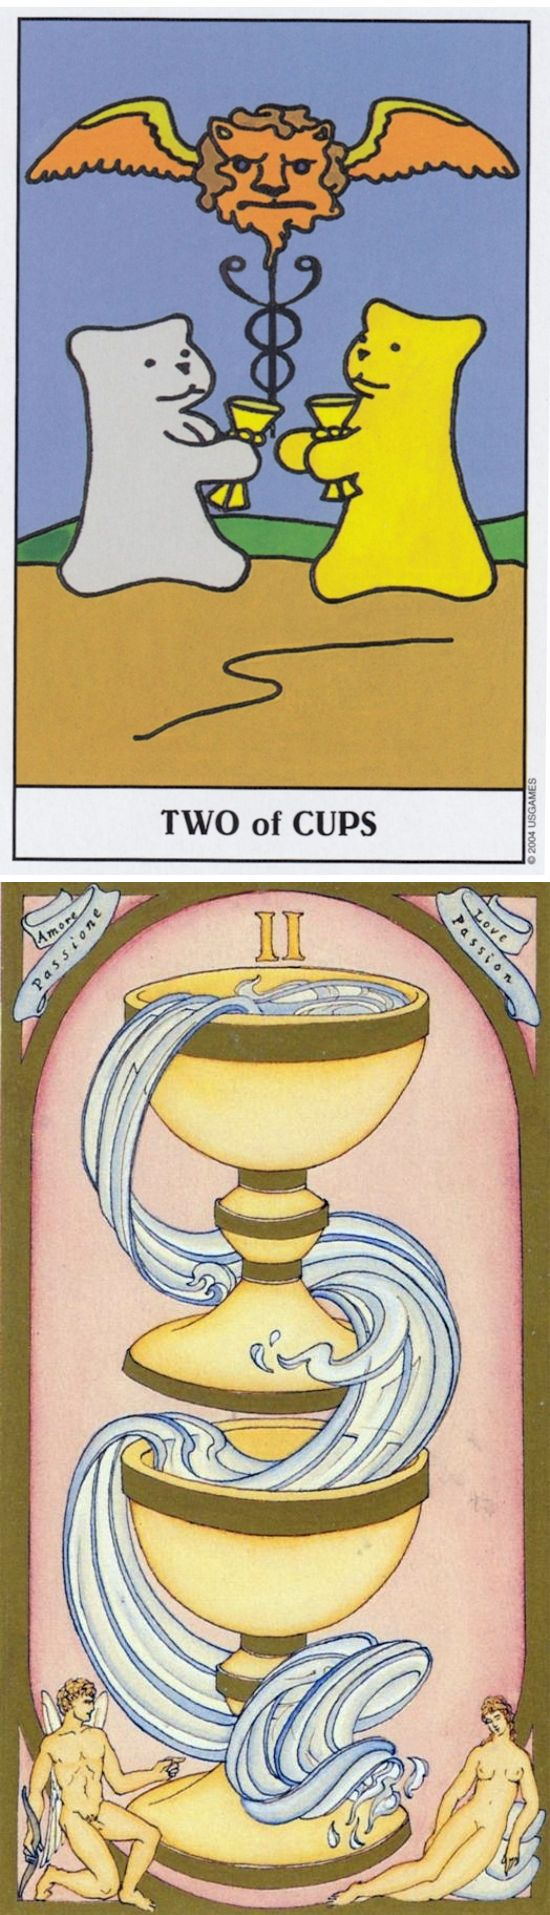 Two of Cups: partnership and imbalance (reverse). Gummy Tarot deck and Renaissance Tarot deck: taro online free, tarotthoth vs tarot cards prediction. The best ritual symbols and fortune telling. #tarotmeaning #halloween2017 #tarotchart #trickortreat